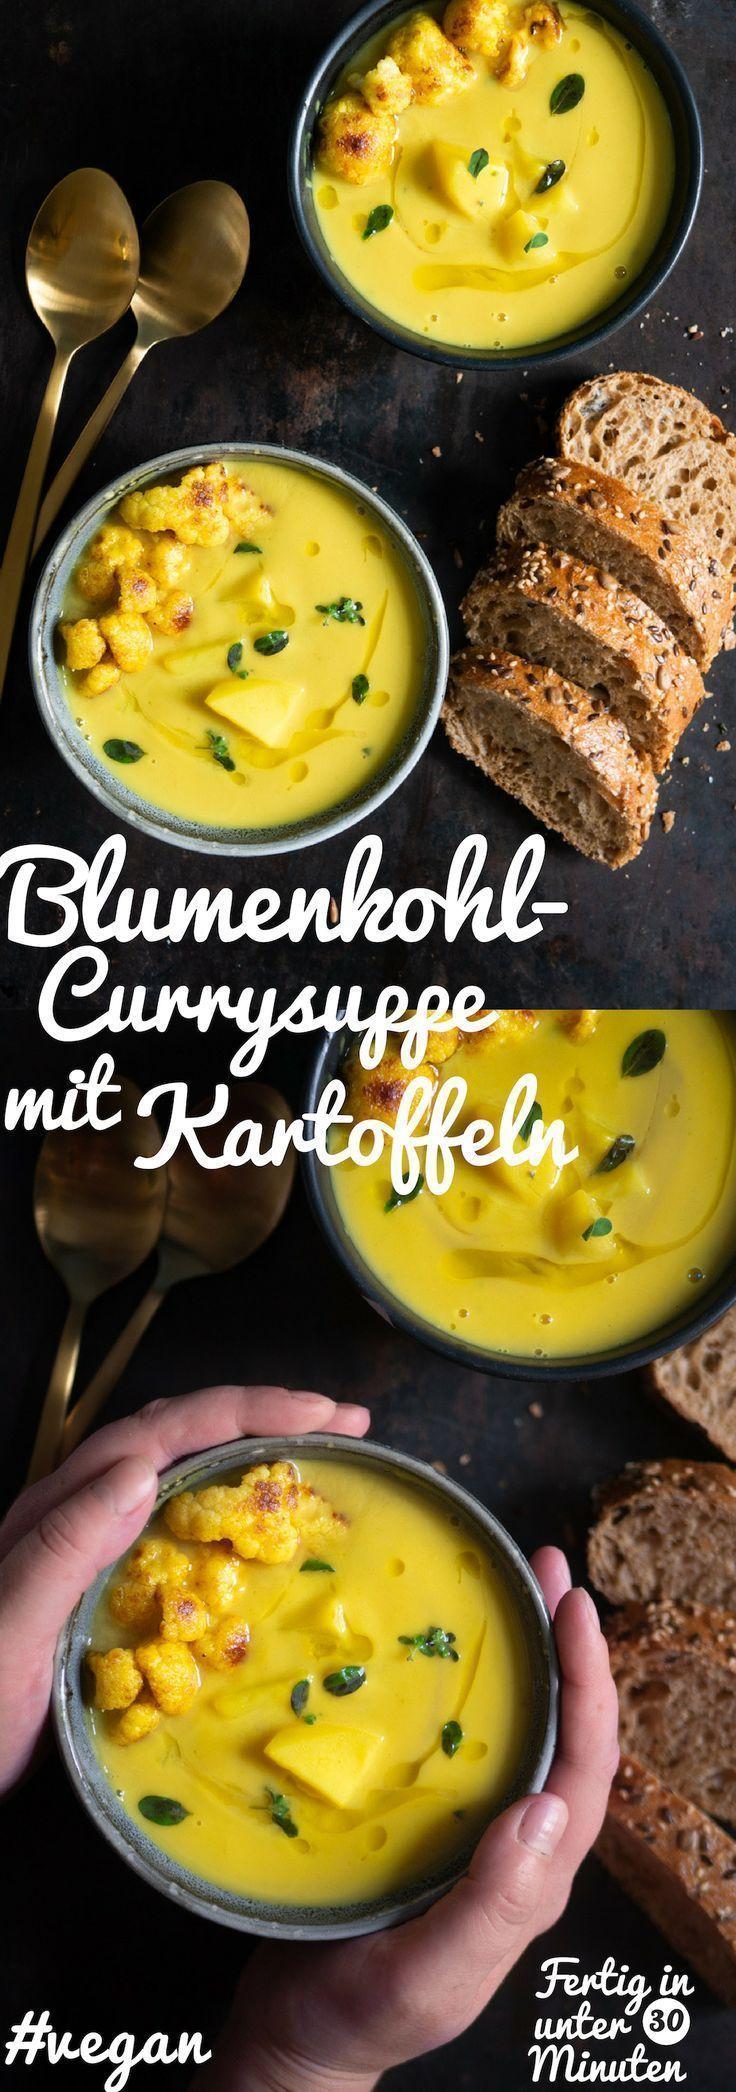 Blumenkohl-Currysuppe mit Kartoffeln #cookiesalad